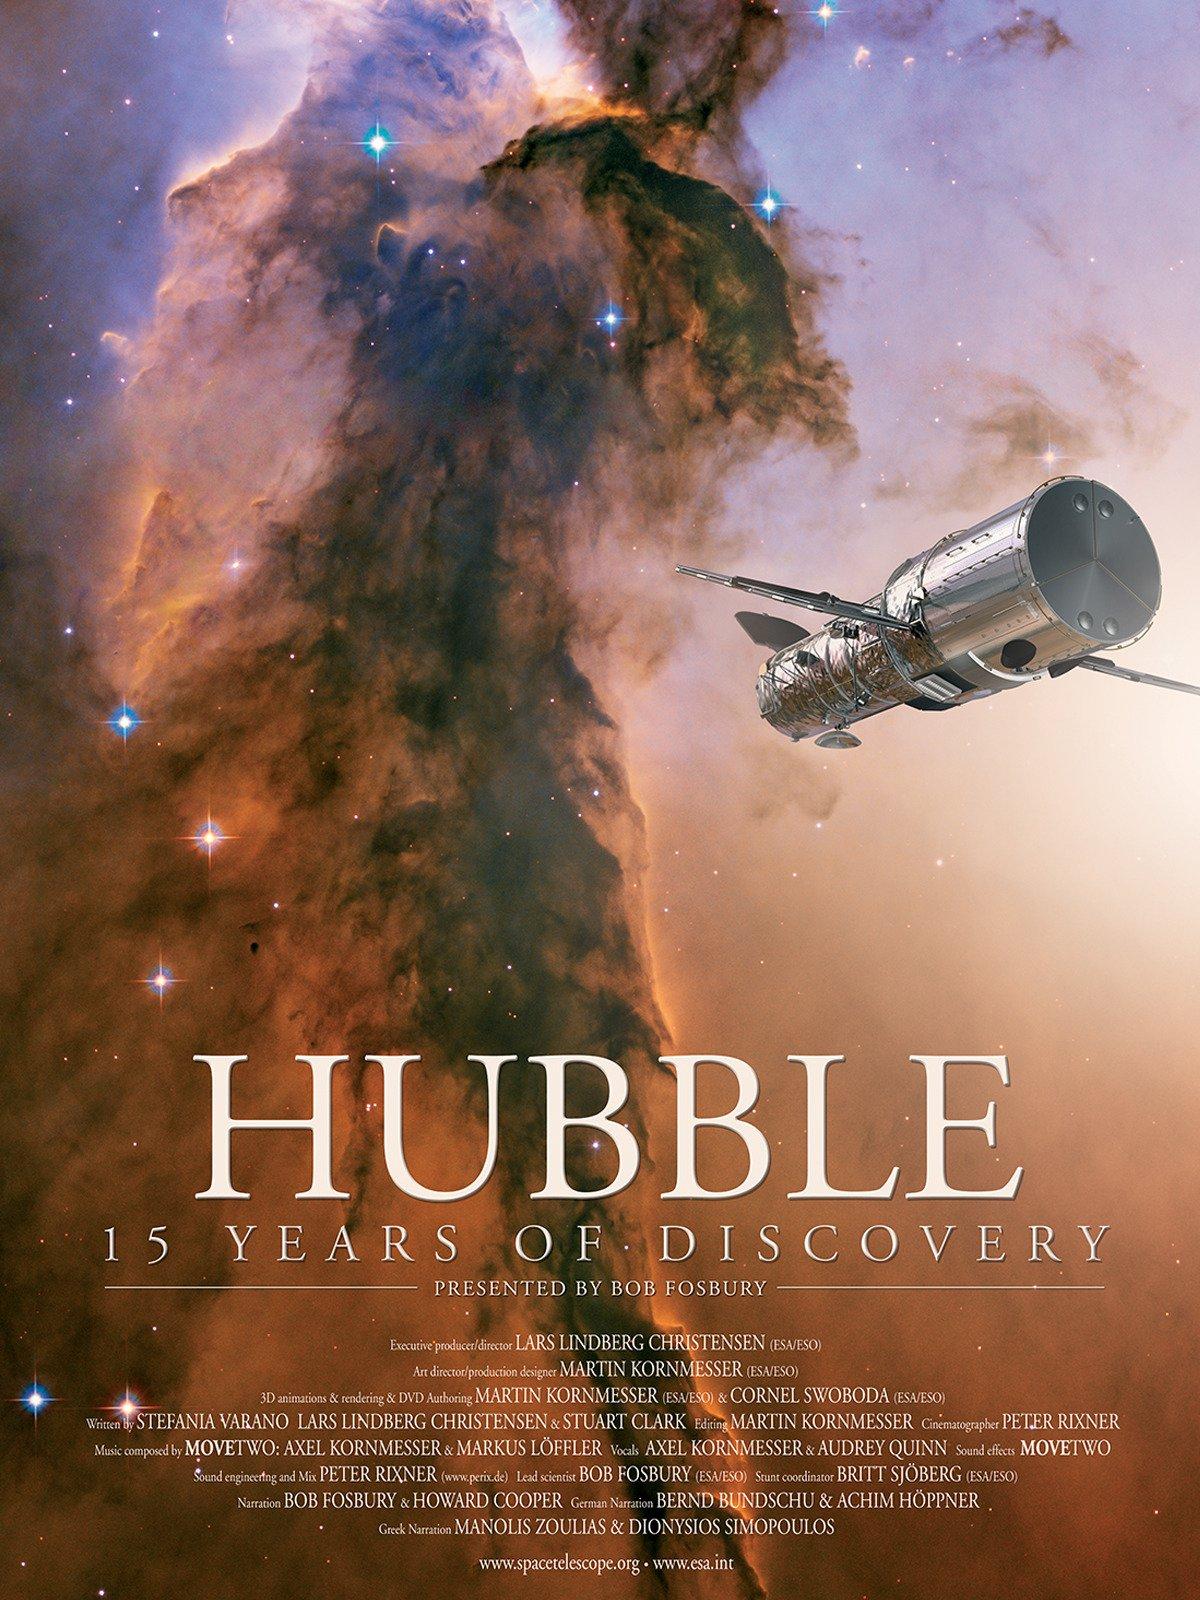 Hubble: 15 Years of Discovery on Amazon Prime Video UK